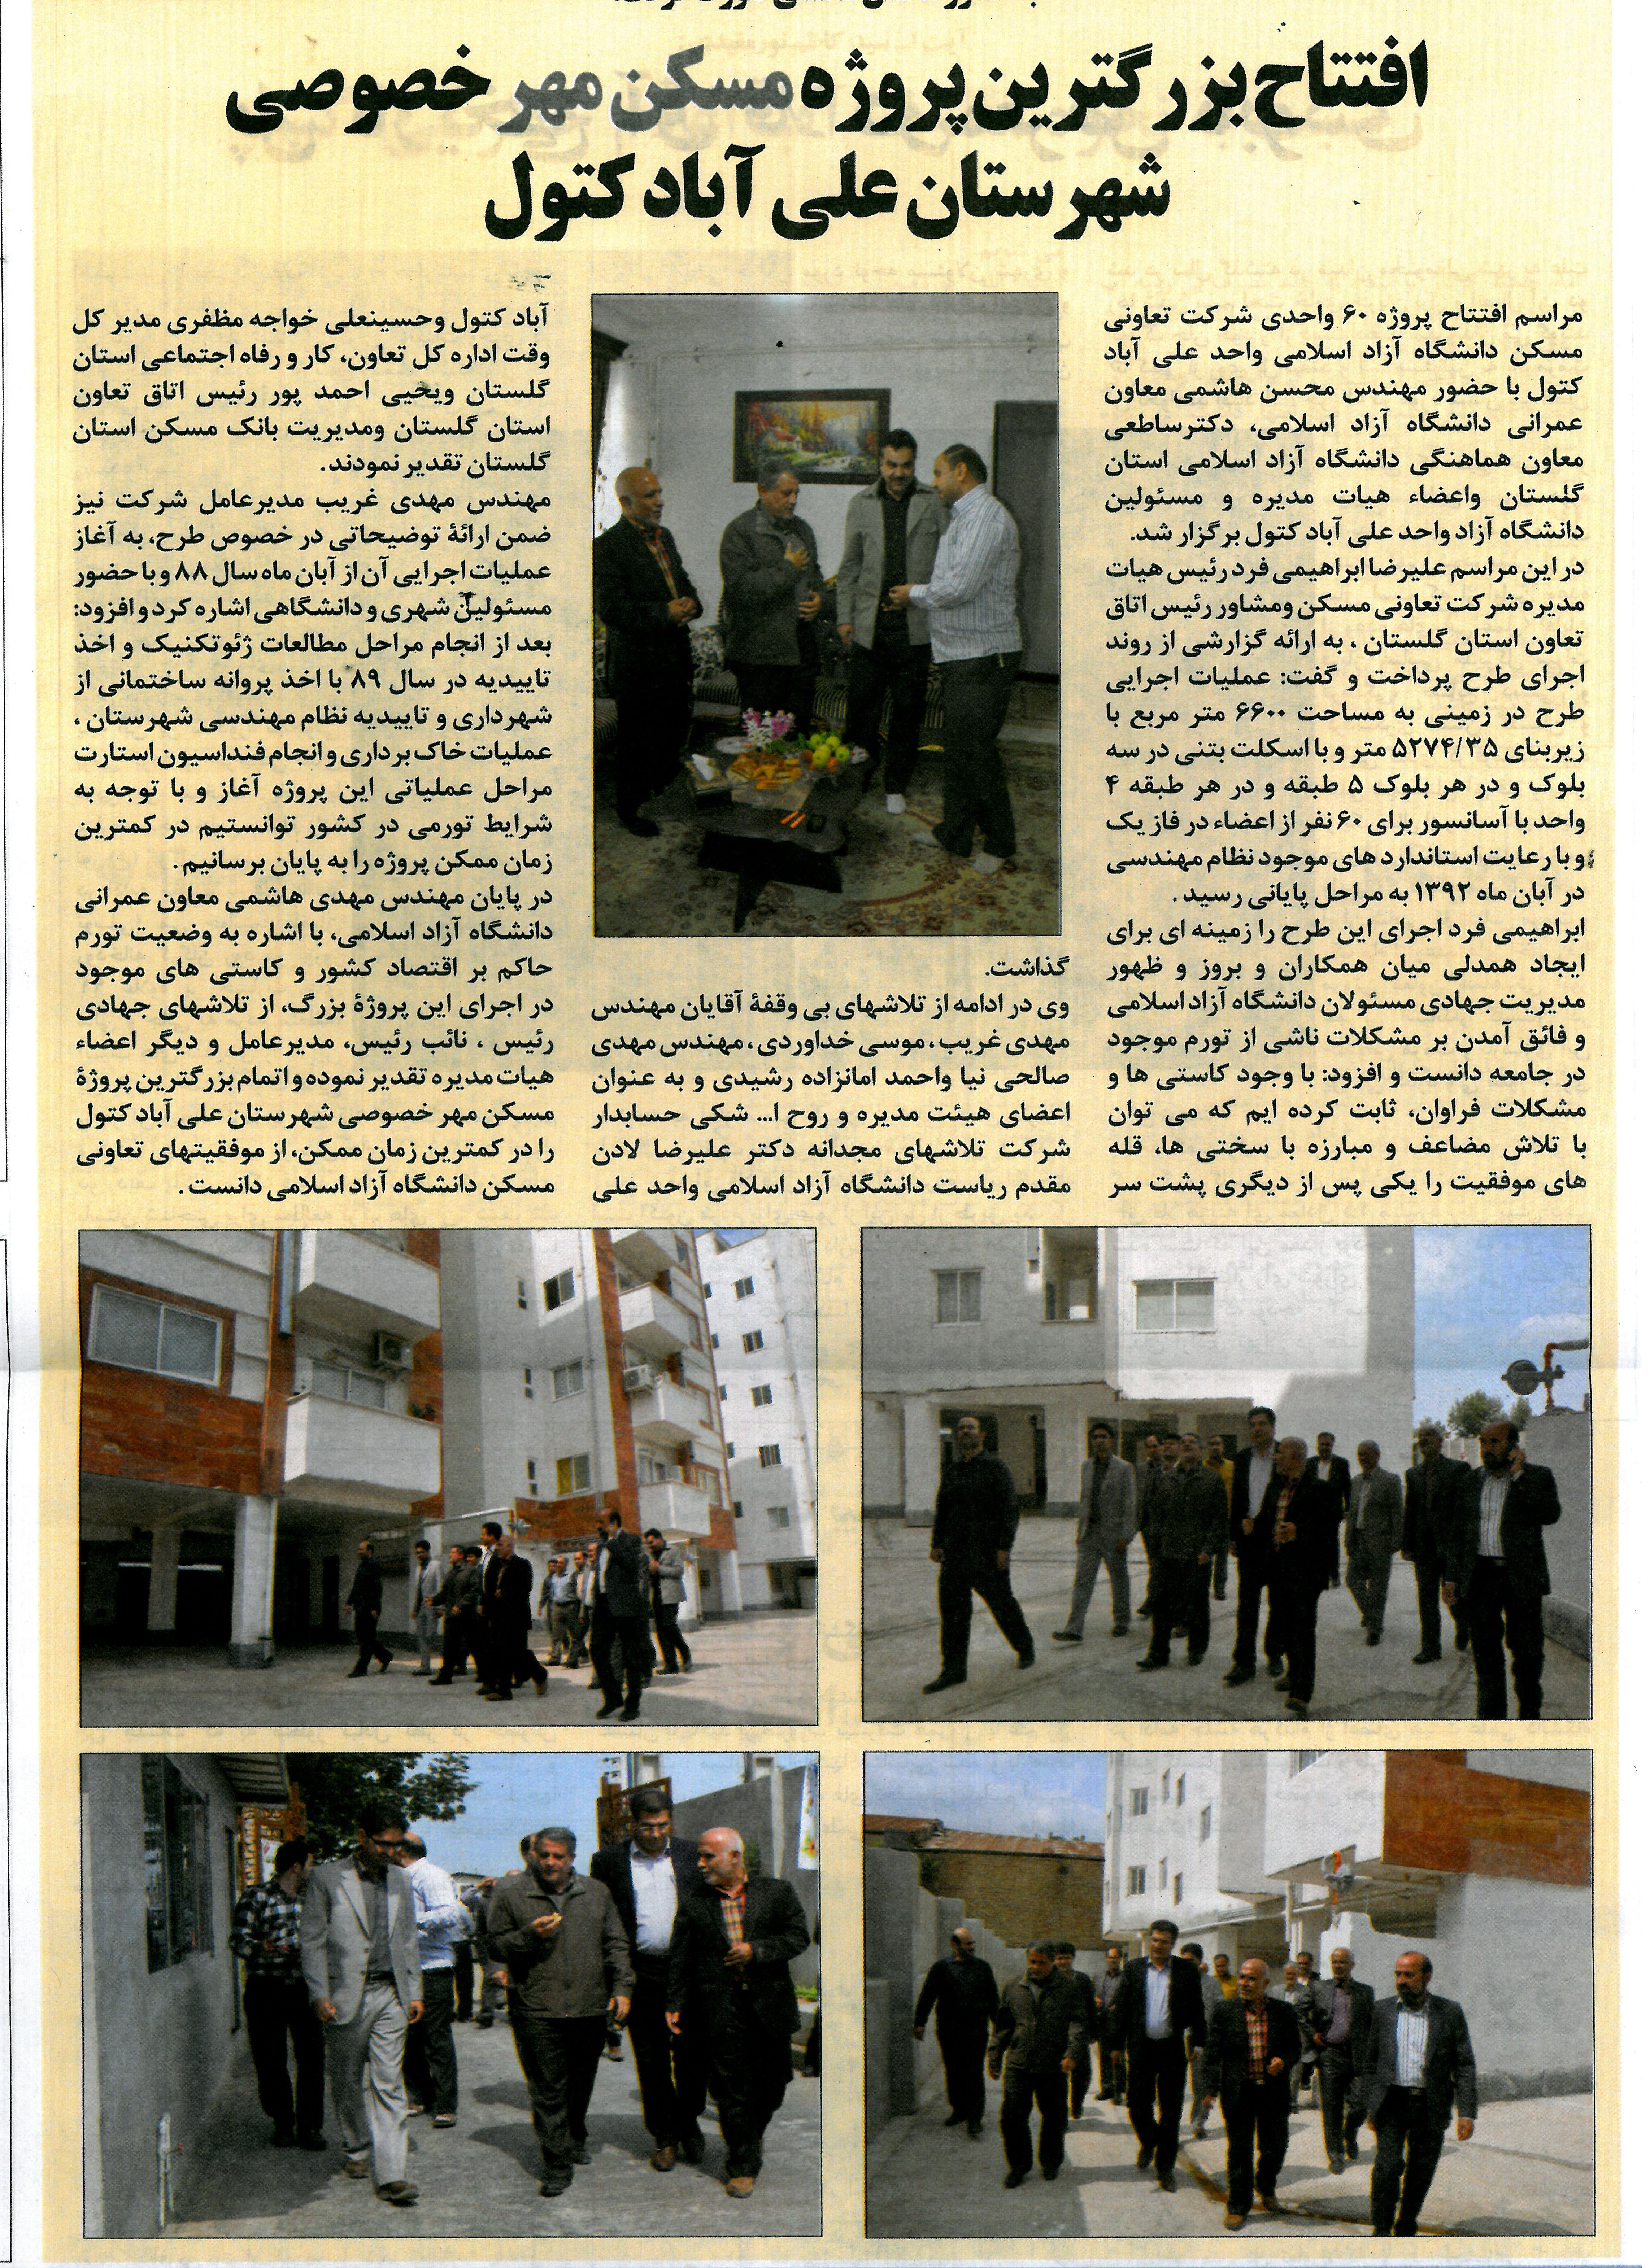 افتتاح بزرگترين پروژه مسكن مهرخصوصي شهرستان علي اباد كتول